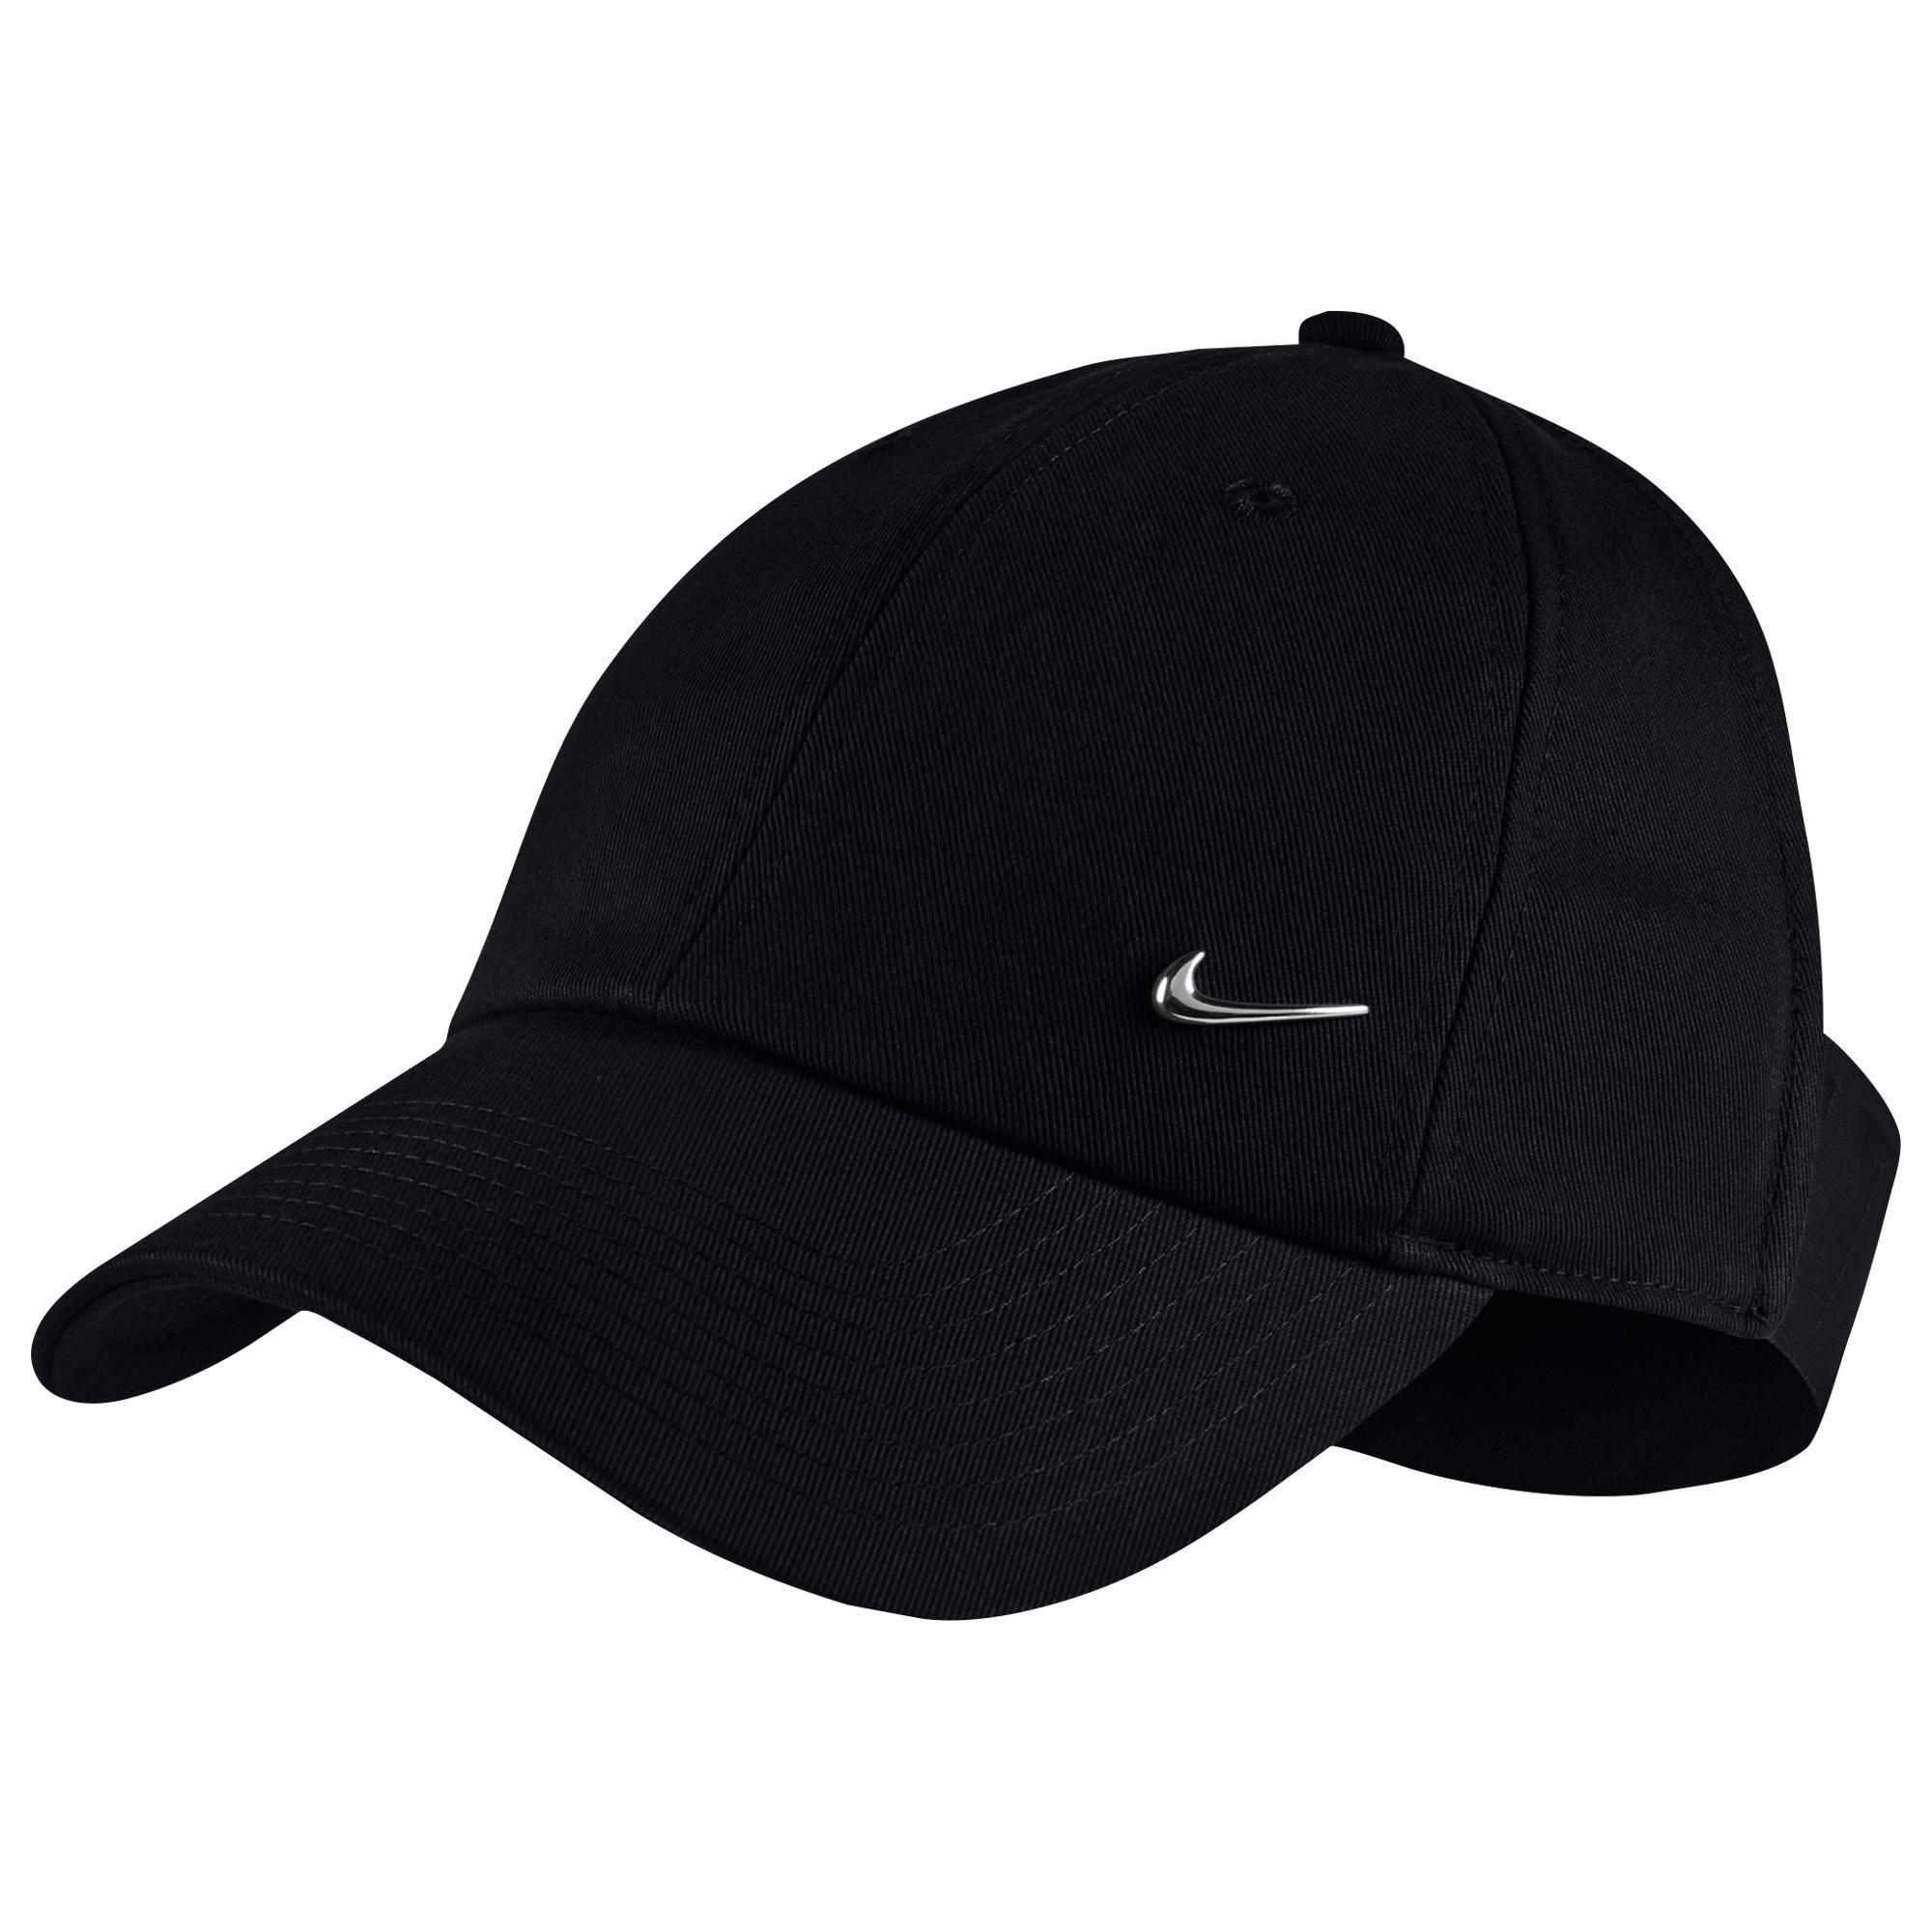 buy online a8dcd 689f1 Nike. Women s Black Nsw Visor Cap